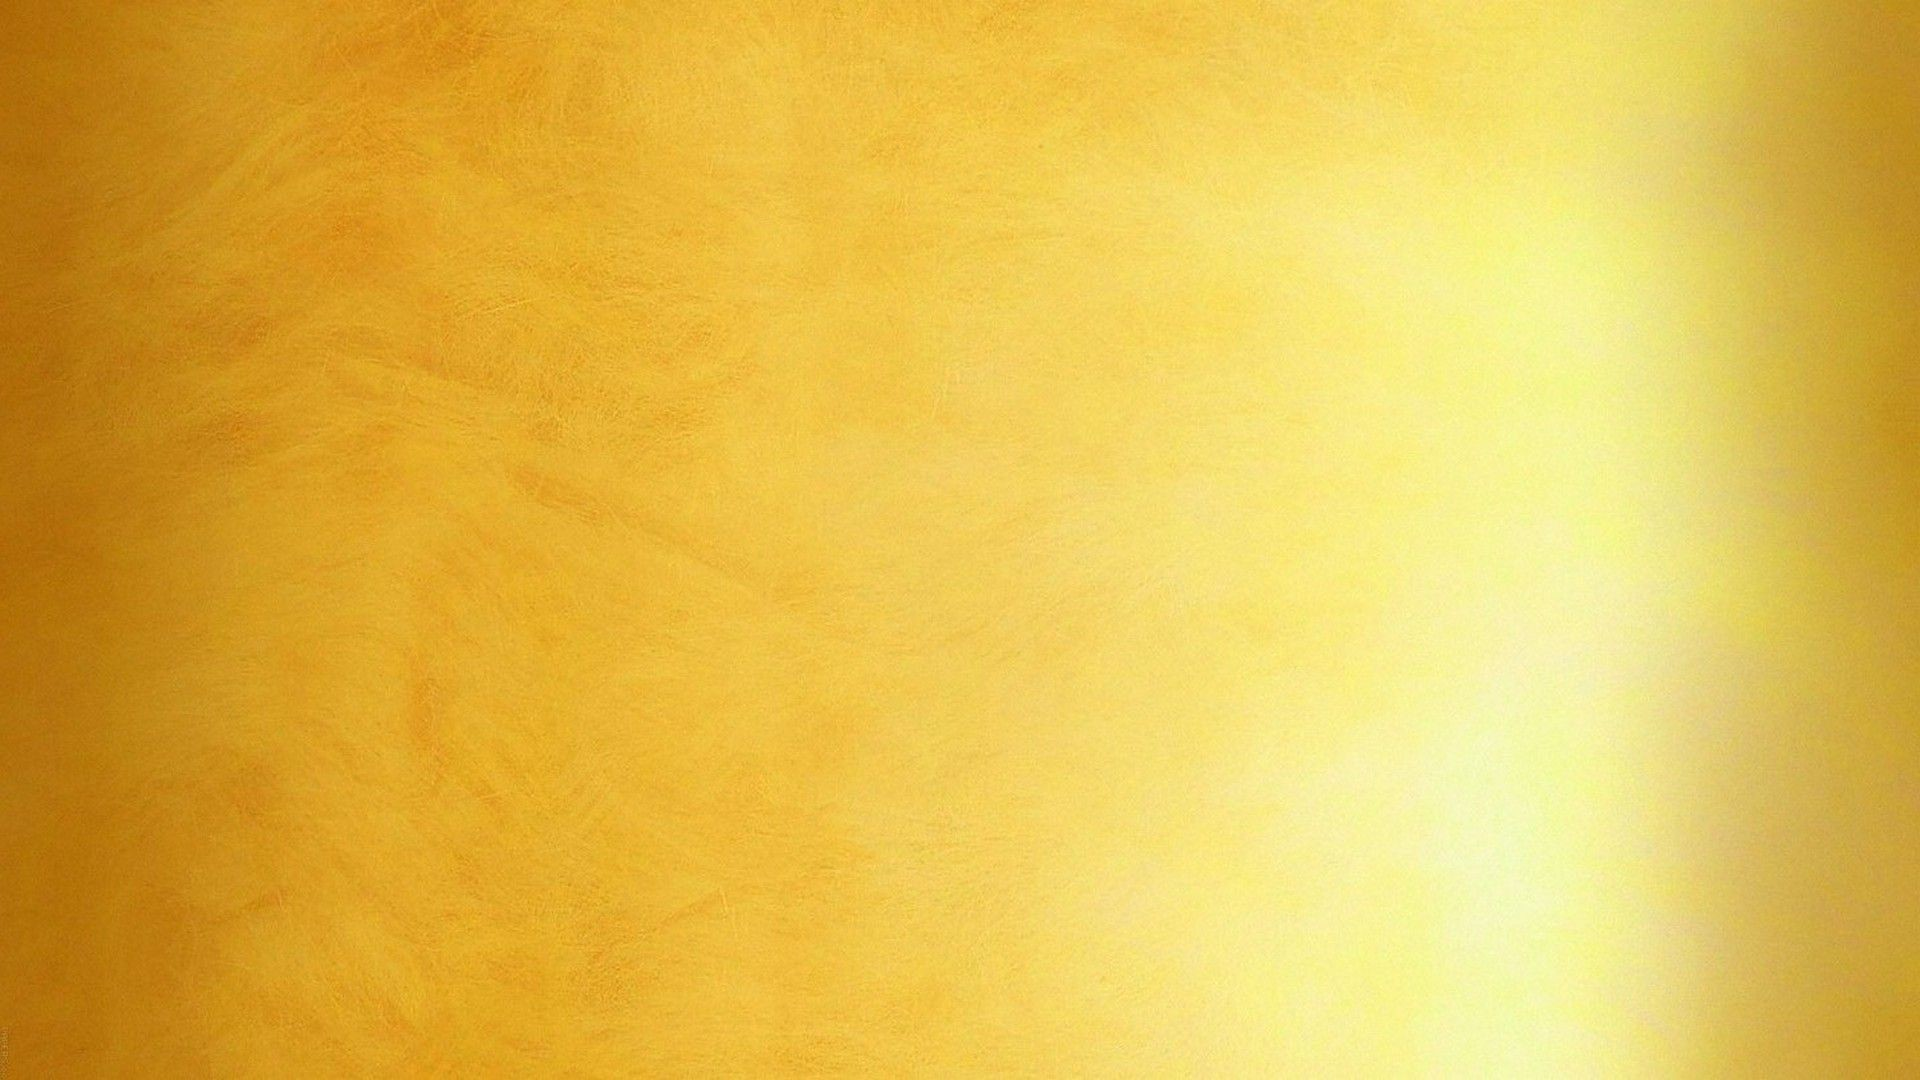 Gold Color Wallpaper 63 Images